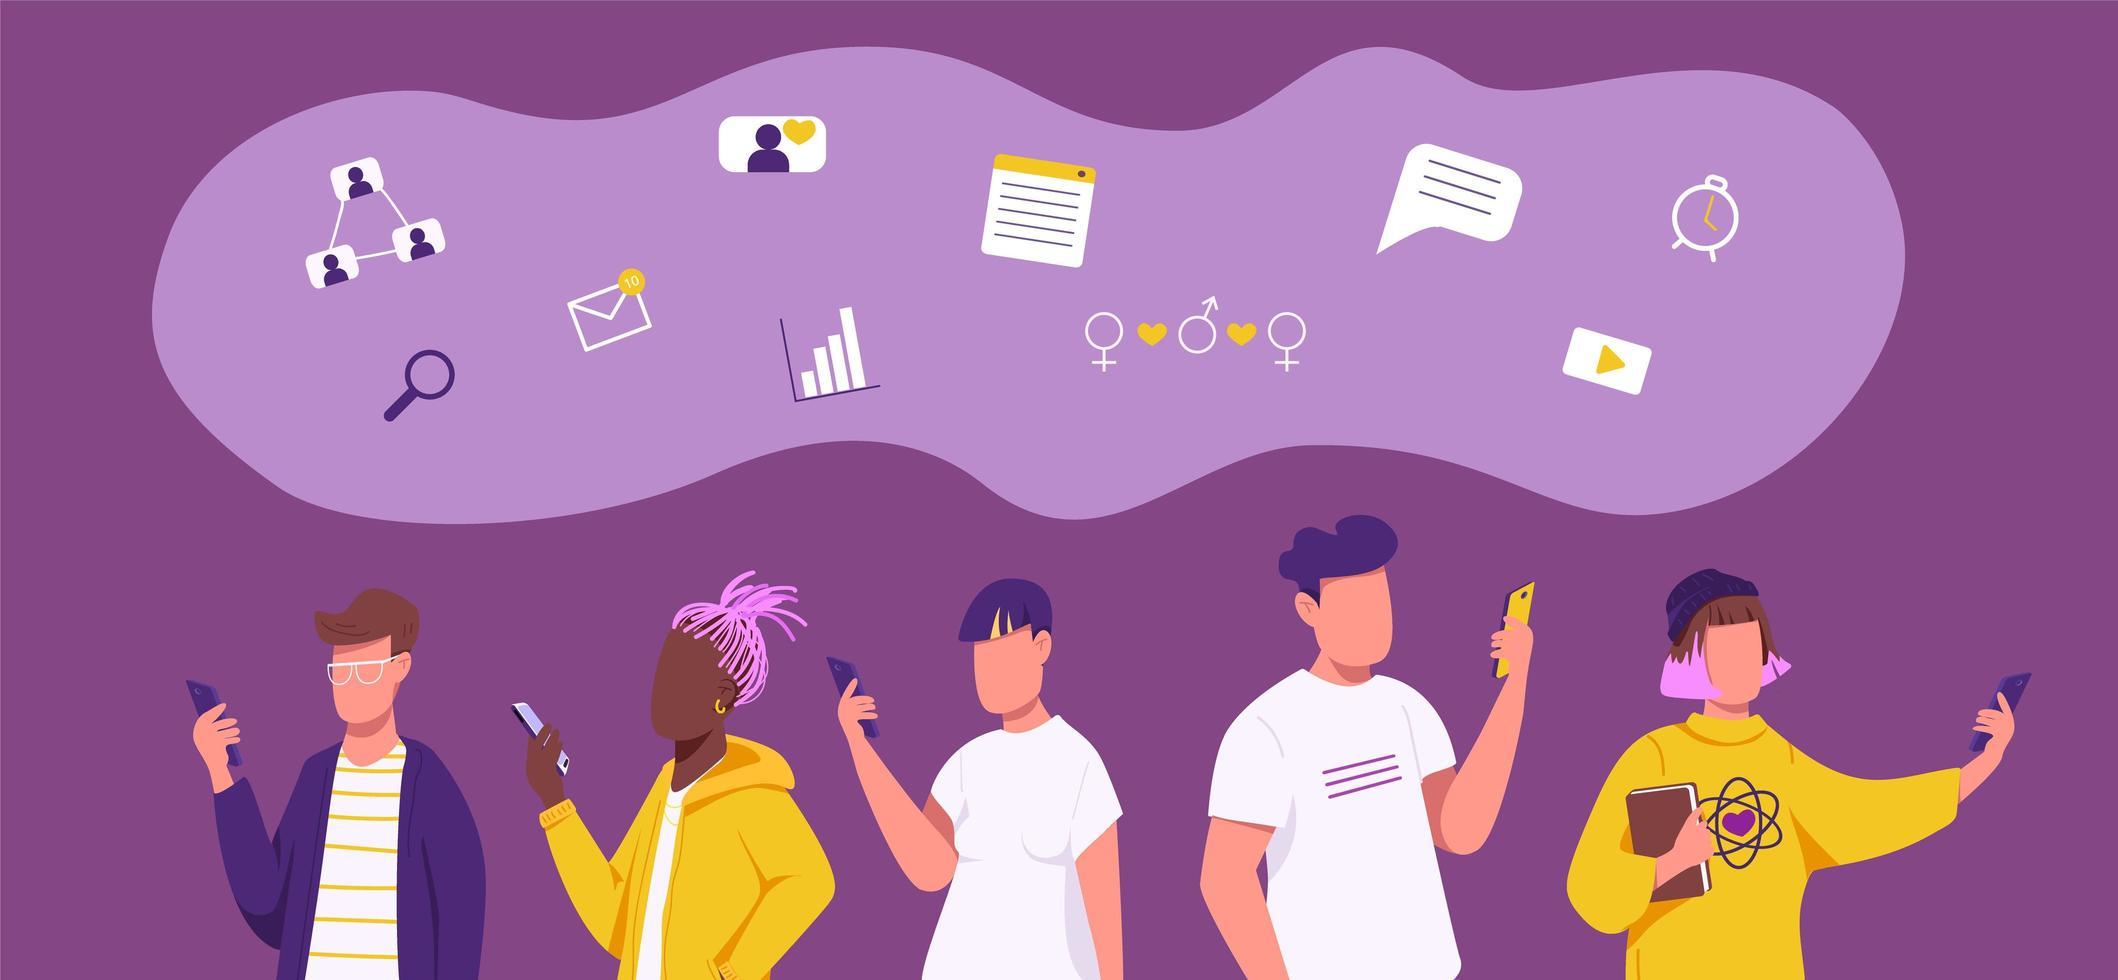 social networking di generazione z vettore